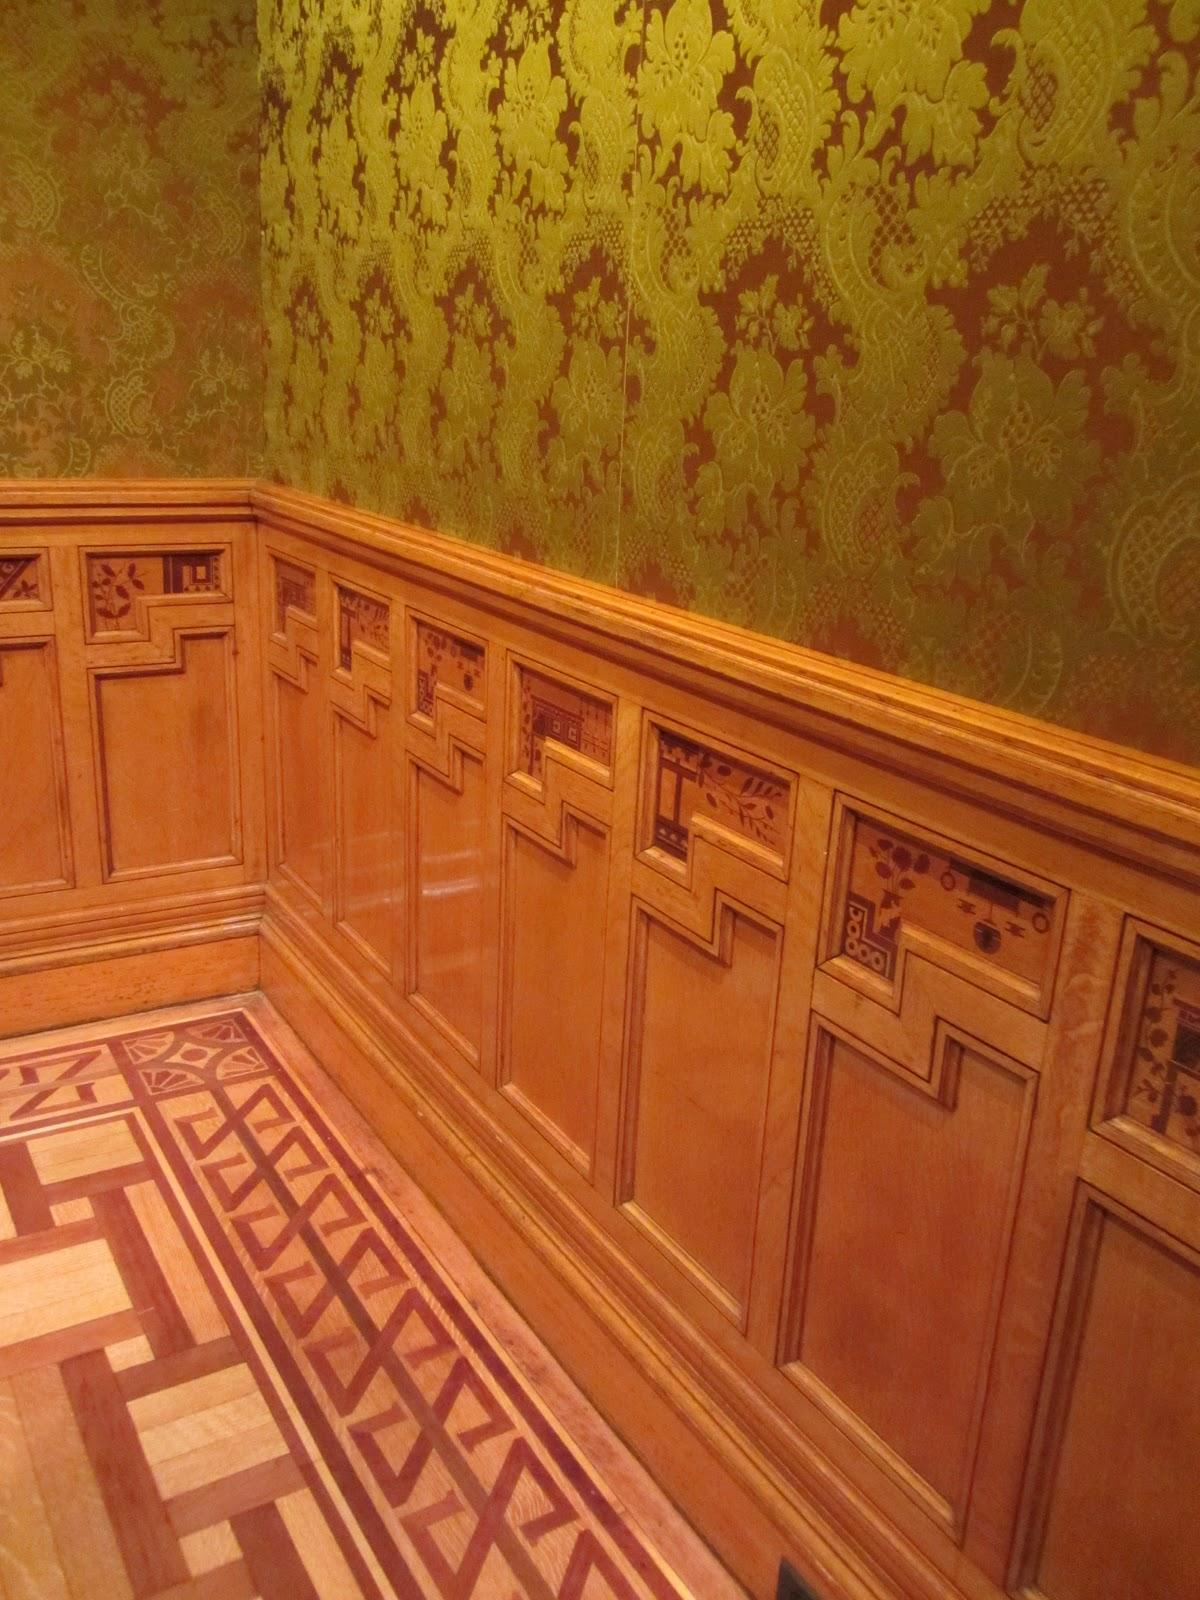 http://4.bp.blogspot.com/-r3RoN0Sc1ns/TyCusrghk3I/AAAAAAAAN9U/1Jg7cIGioGI/s1600/Dreihaus+wallpaper%252C+floor.jpg